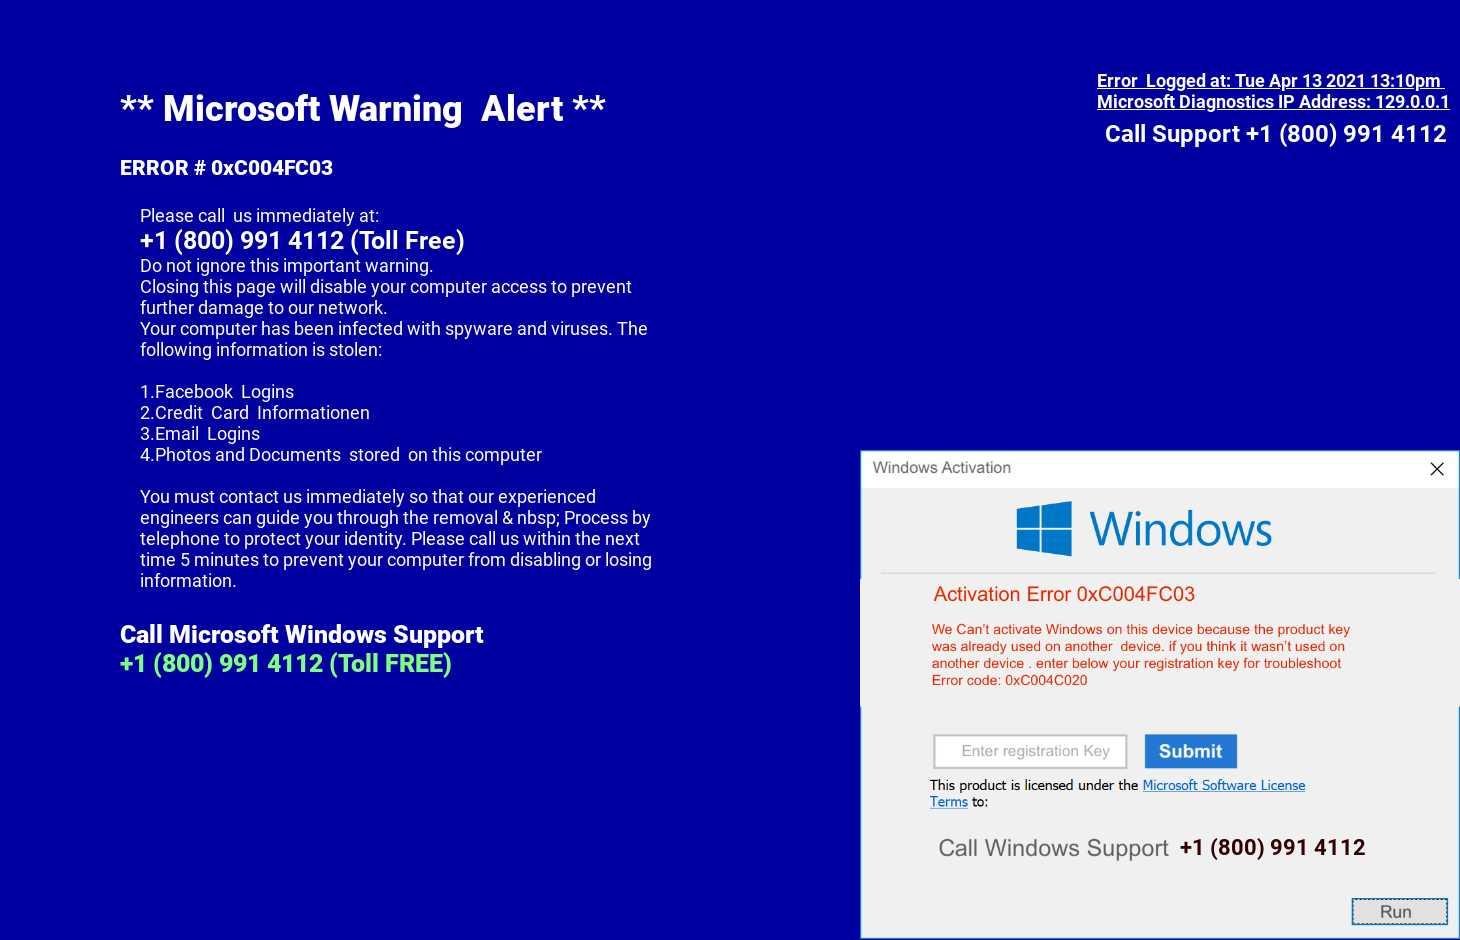 Cyber criminals use malvertising Microsoft scam